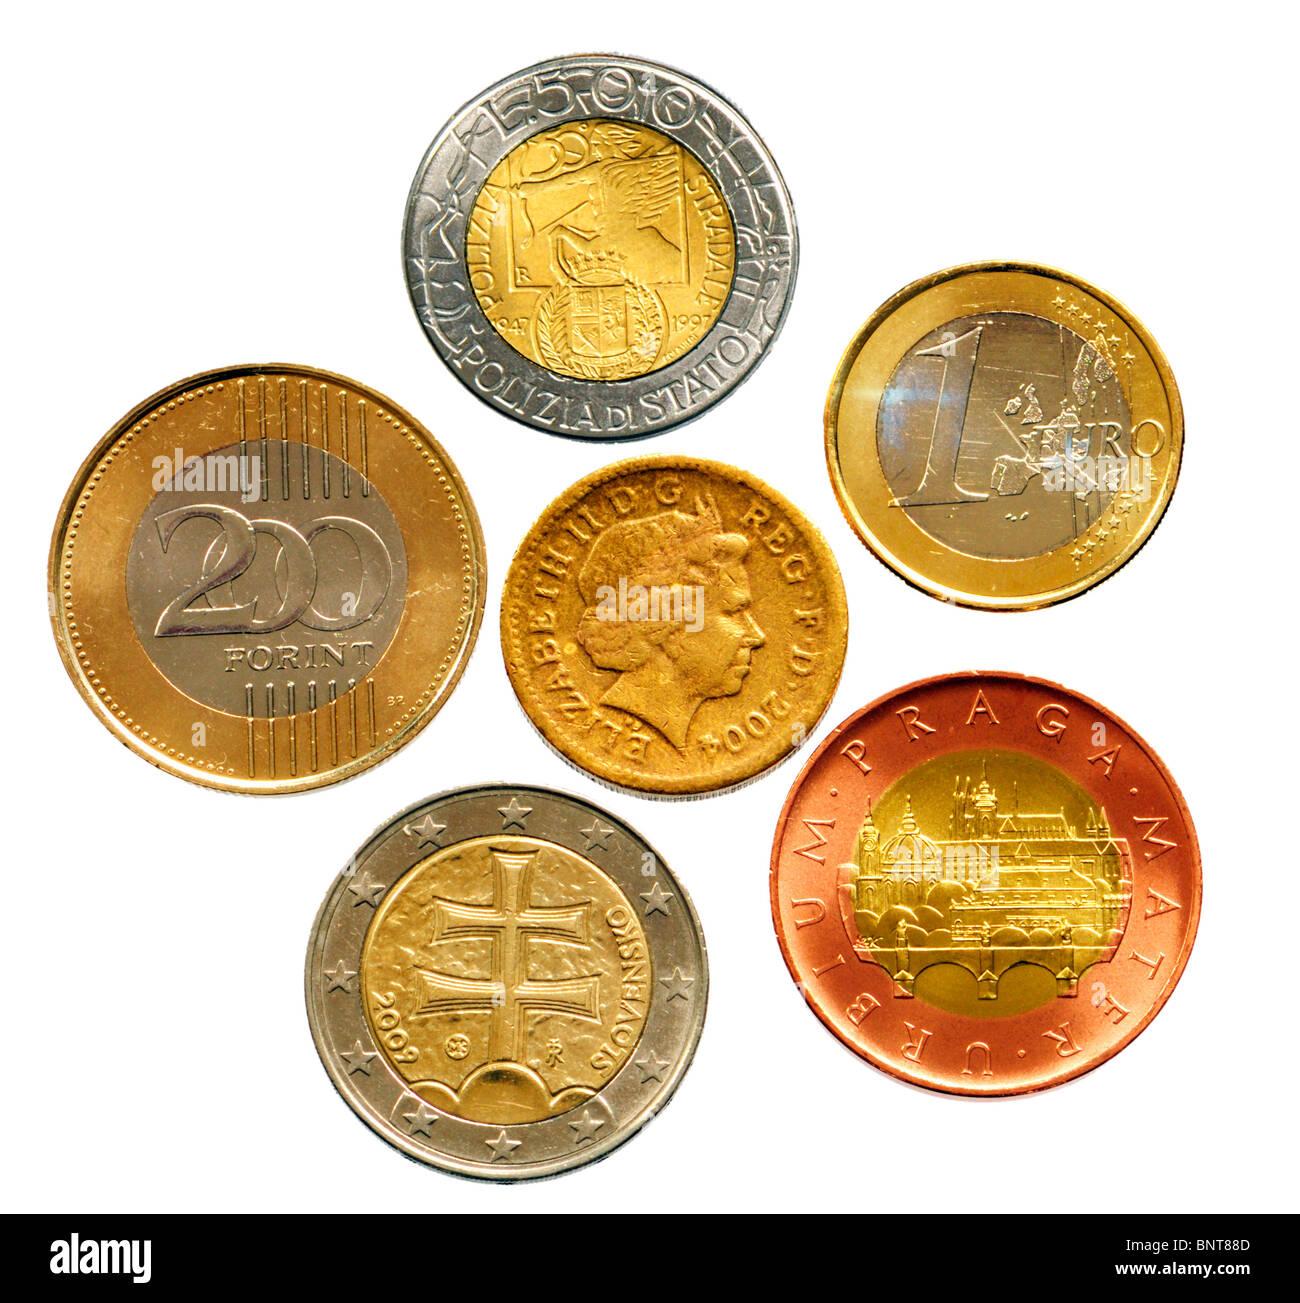 Pre euro italian coin worth : Eko coin cap quote